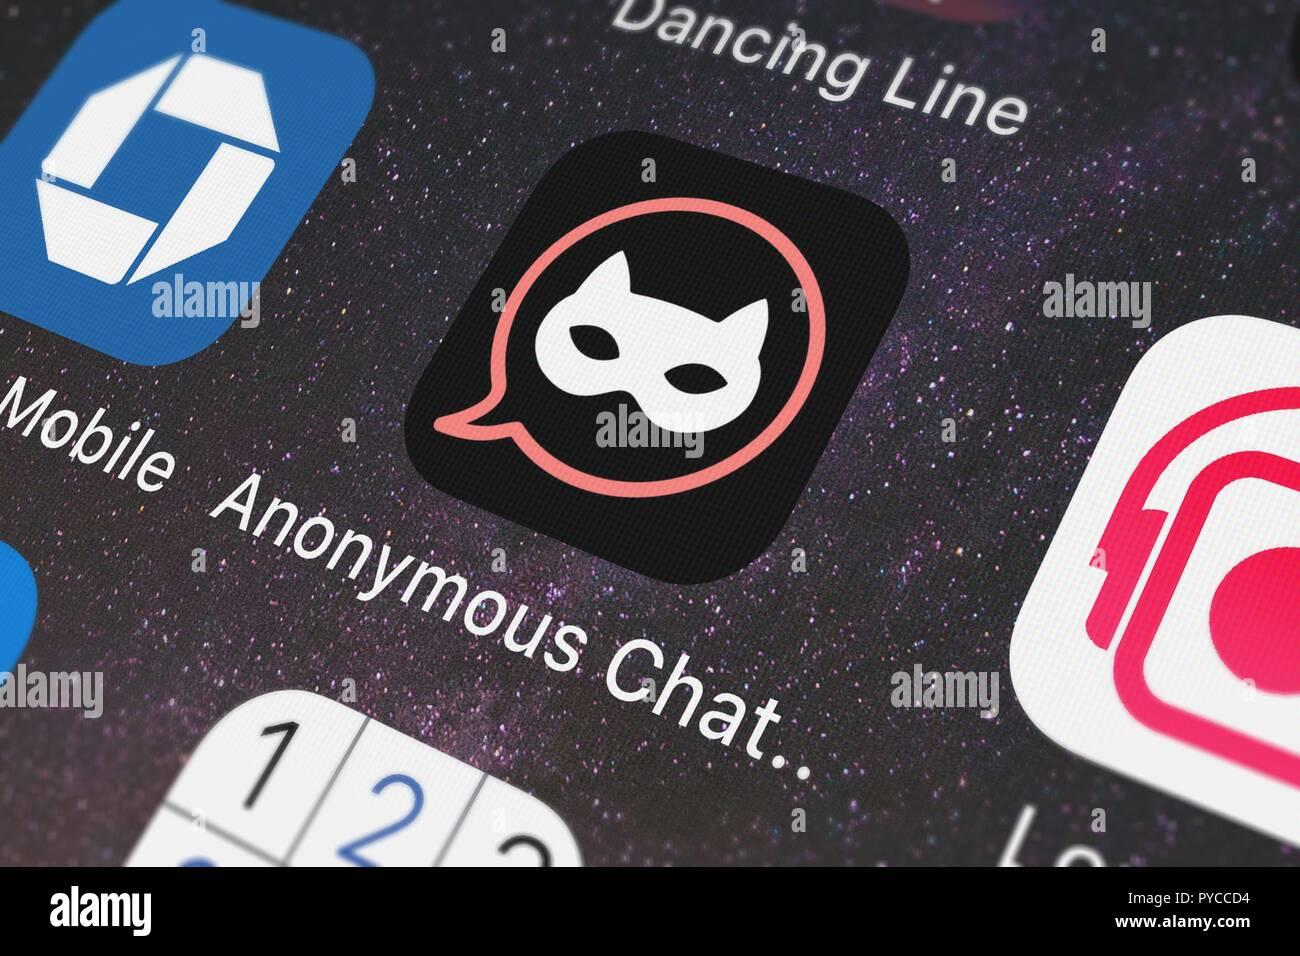 Anonym chat